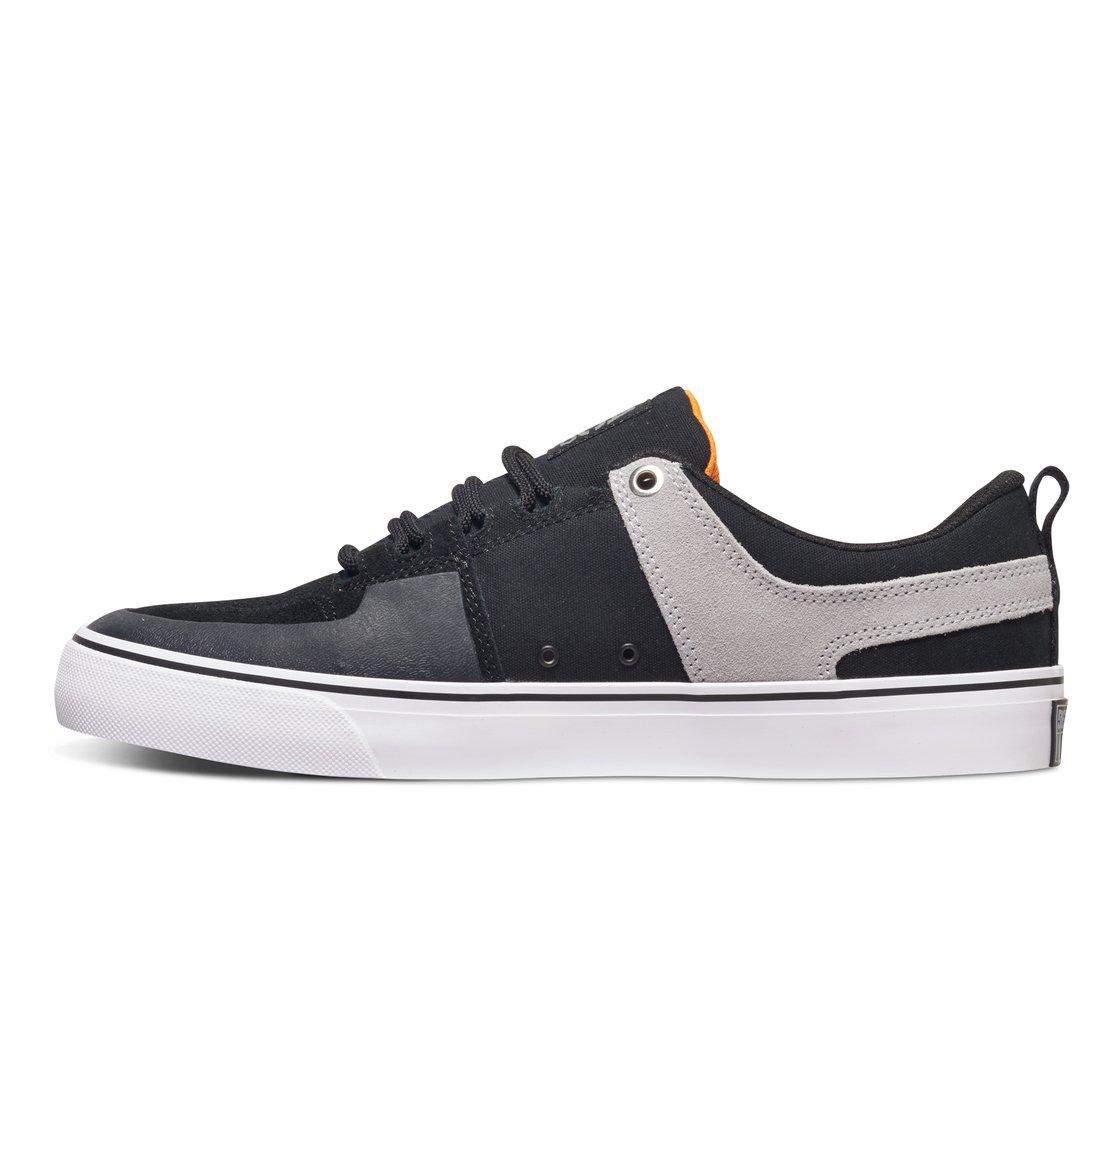 Grille Des Tailles Dc Shoes Chaussure Homme